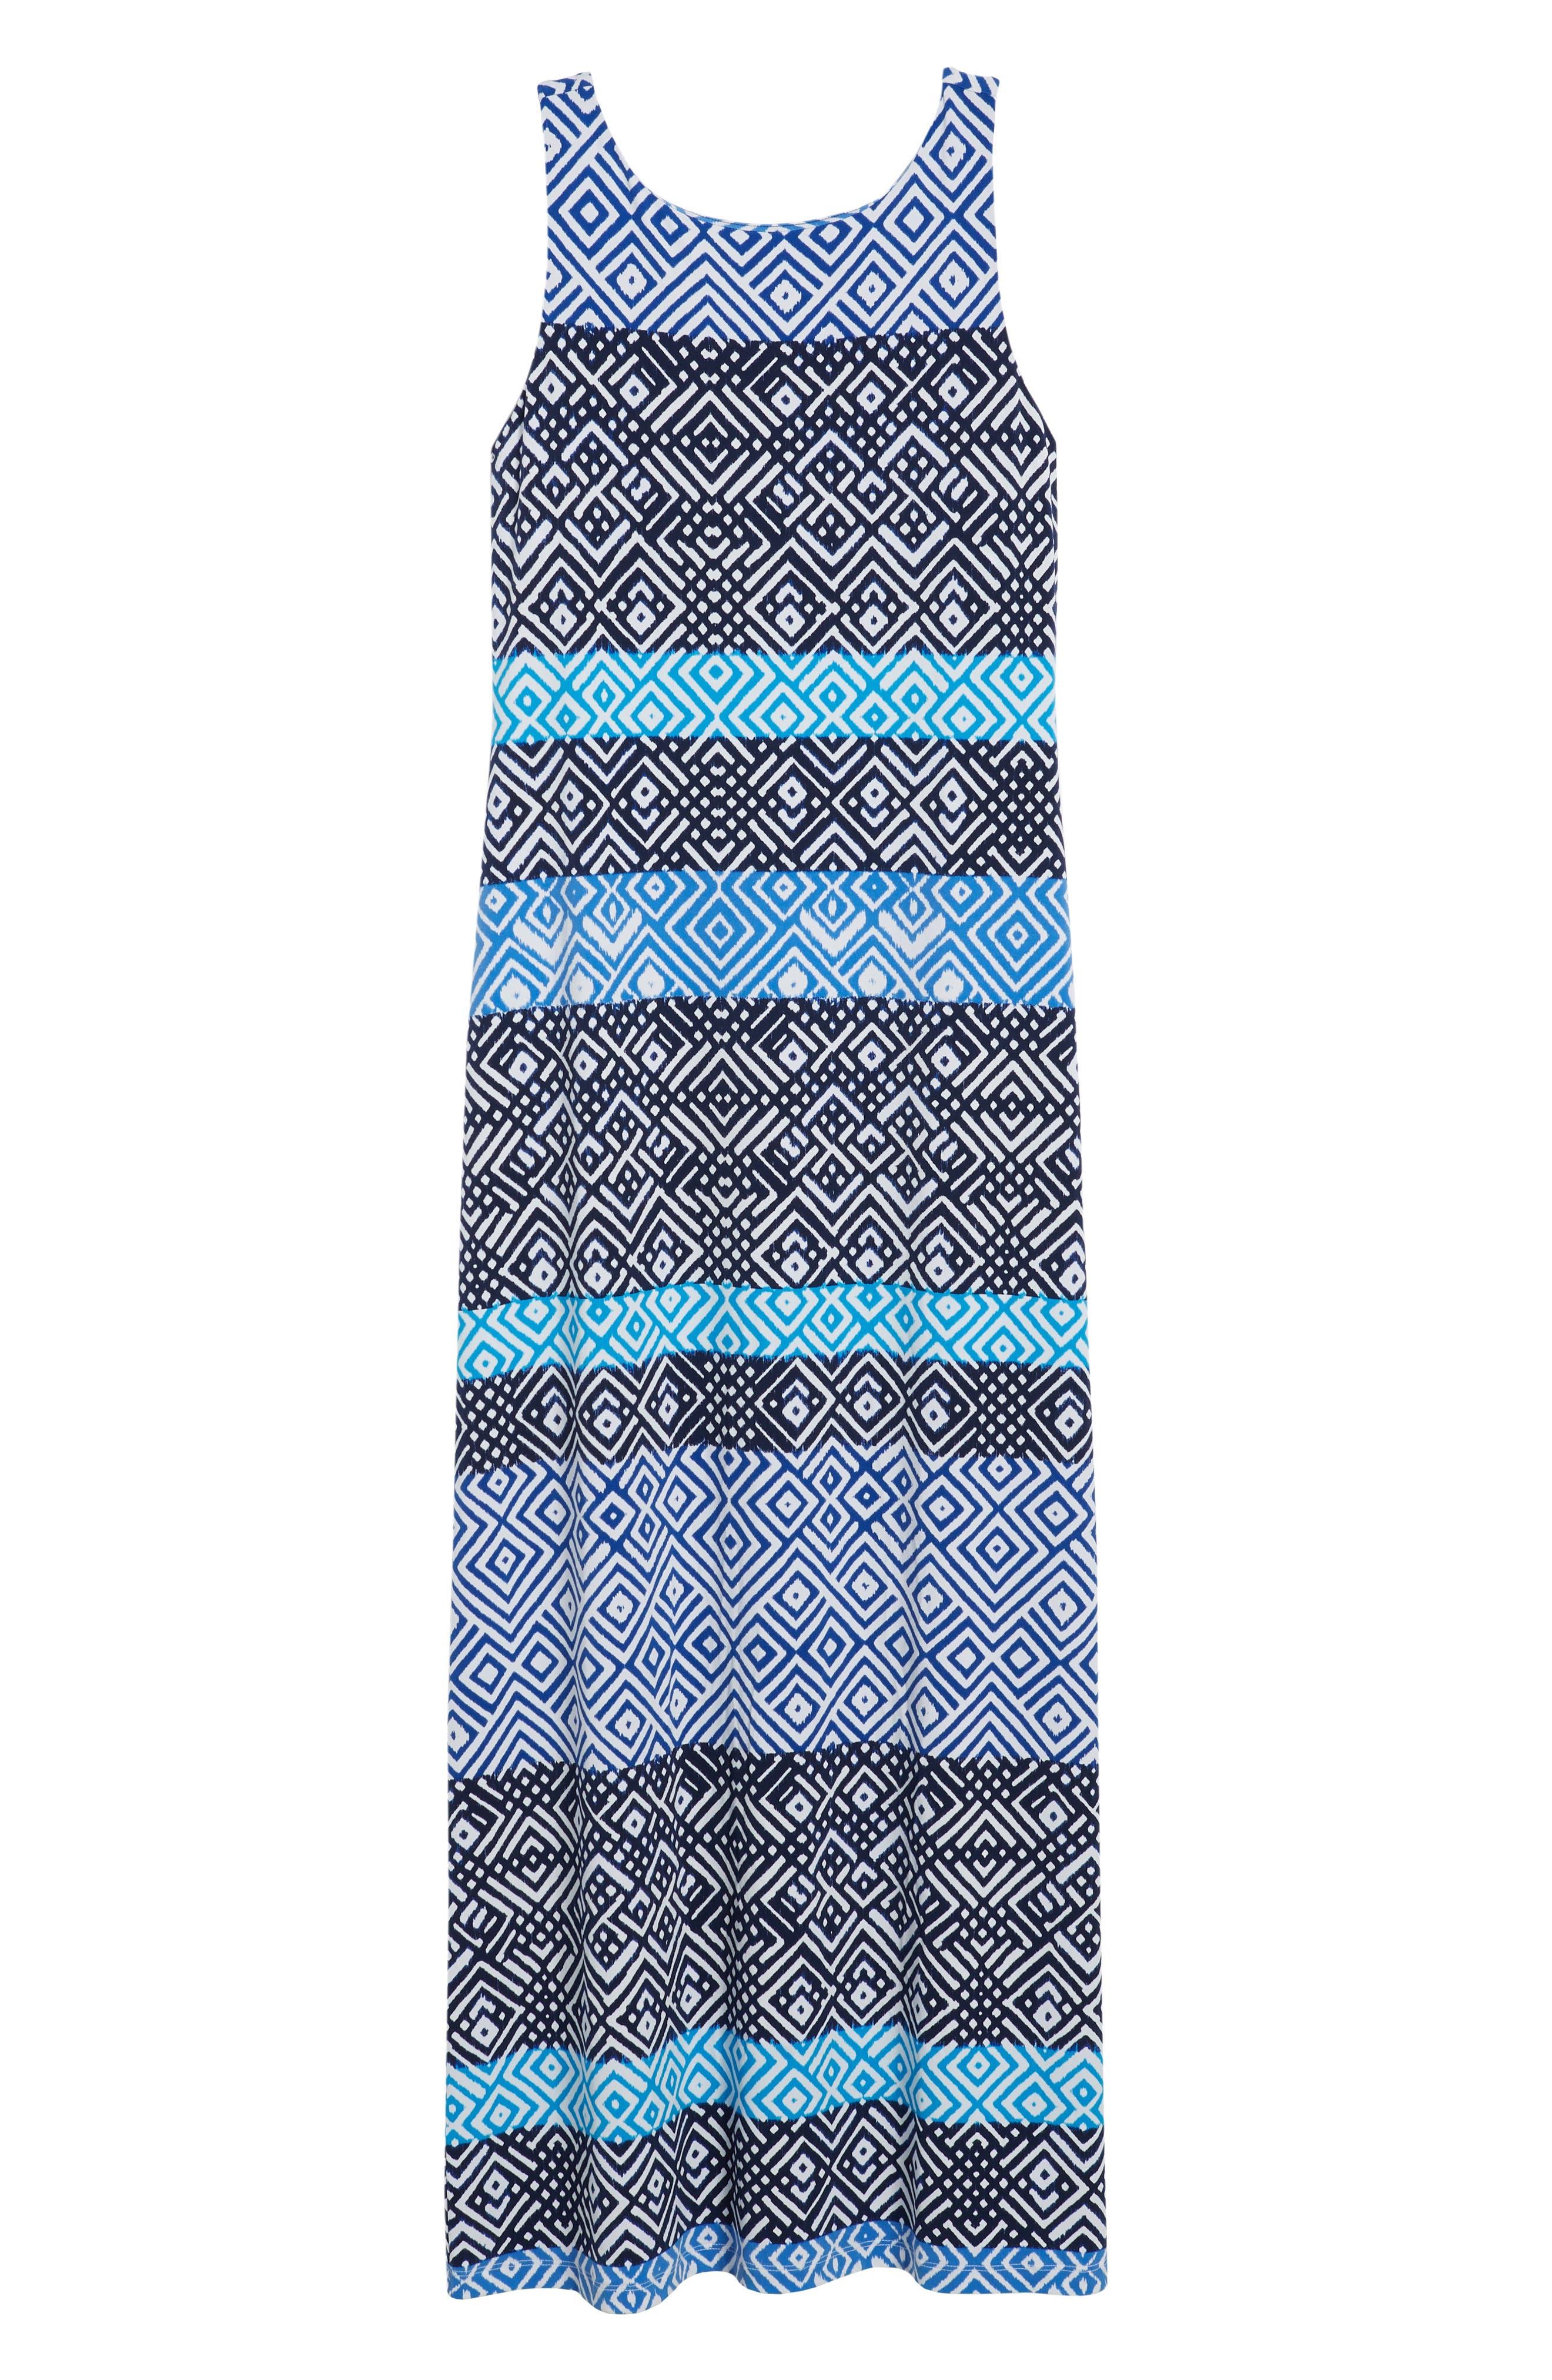 Mayan Maze Maxi Dress,                             Alternate thumbnail 7, color,                             Ocean Deep